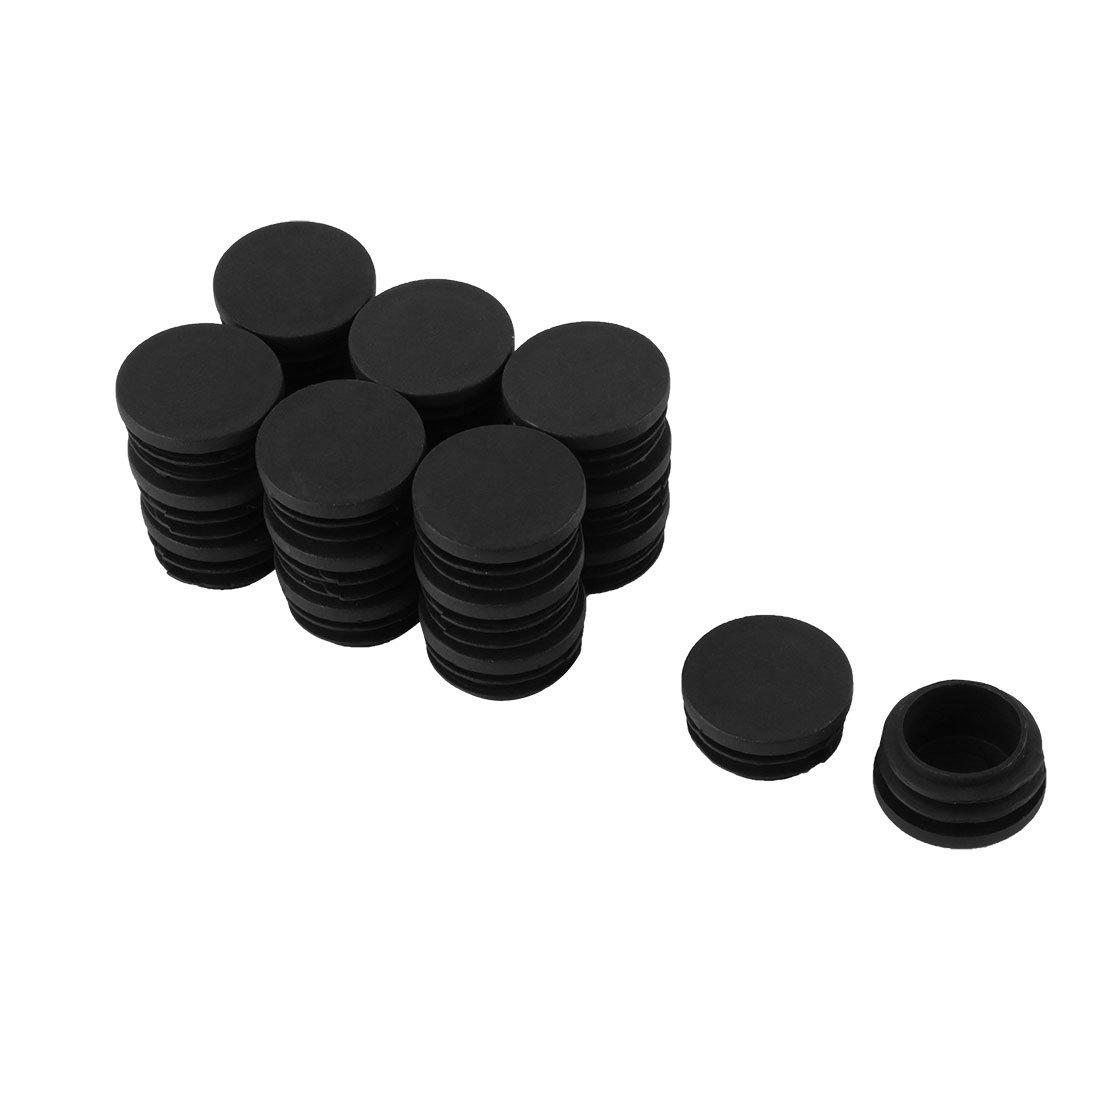 uxcell Plastic Family Round Chair Legs Cap Tube Insert 30mm Diameter 20 Pcs Black a15122100ux0441